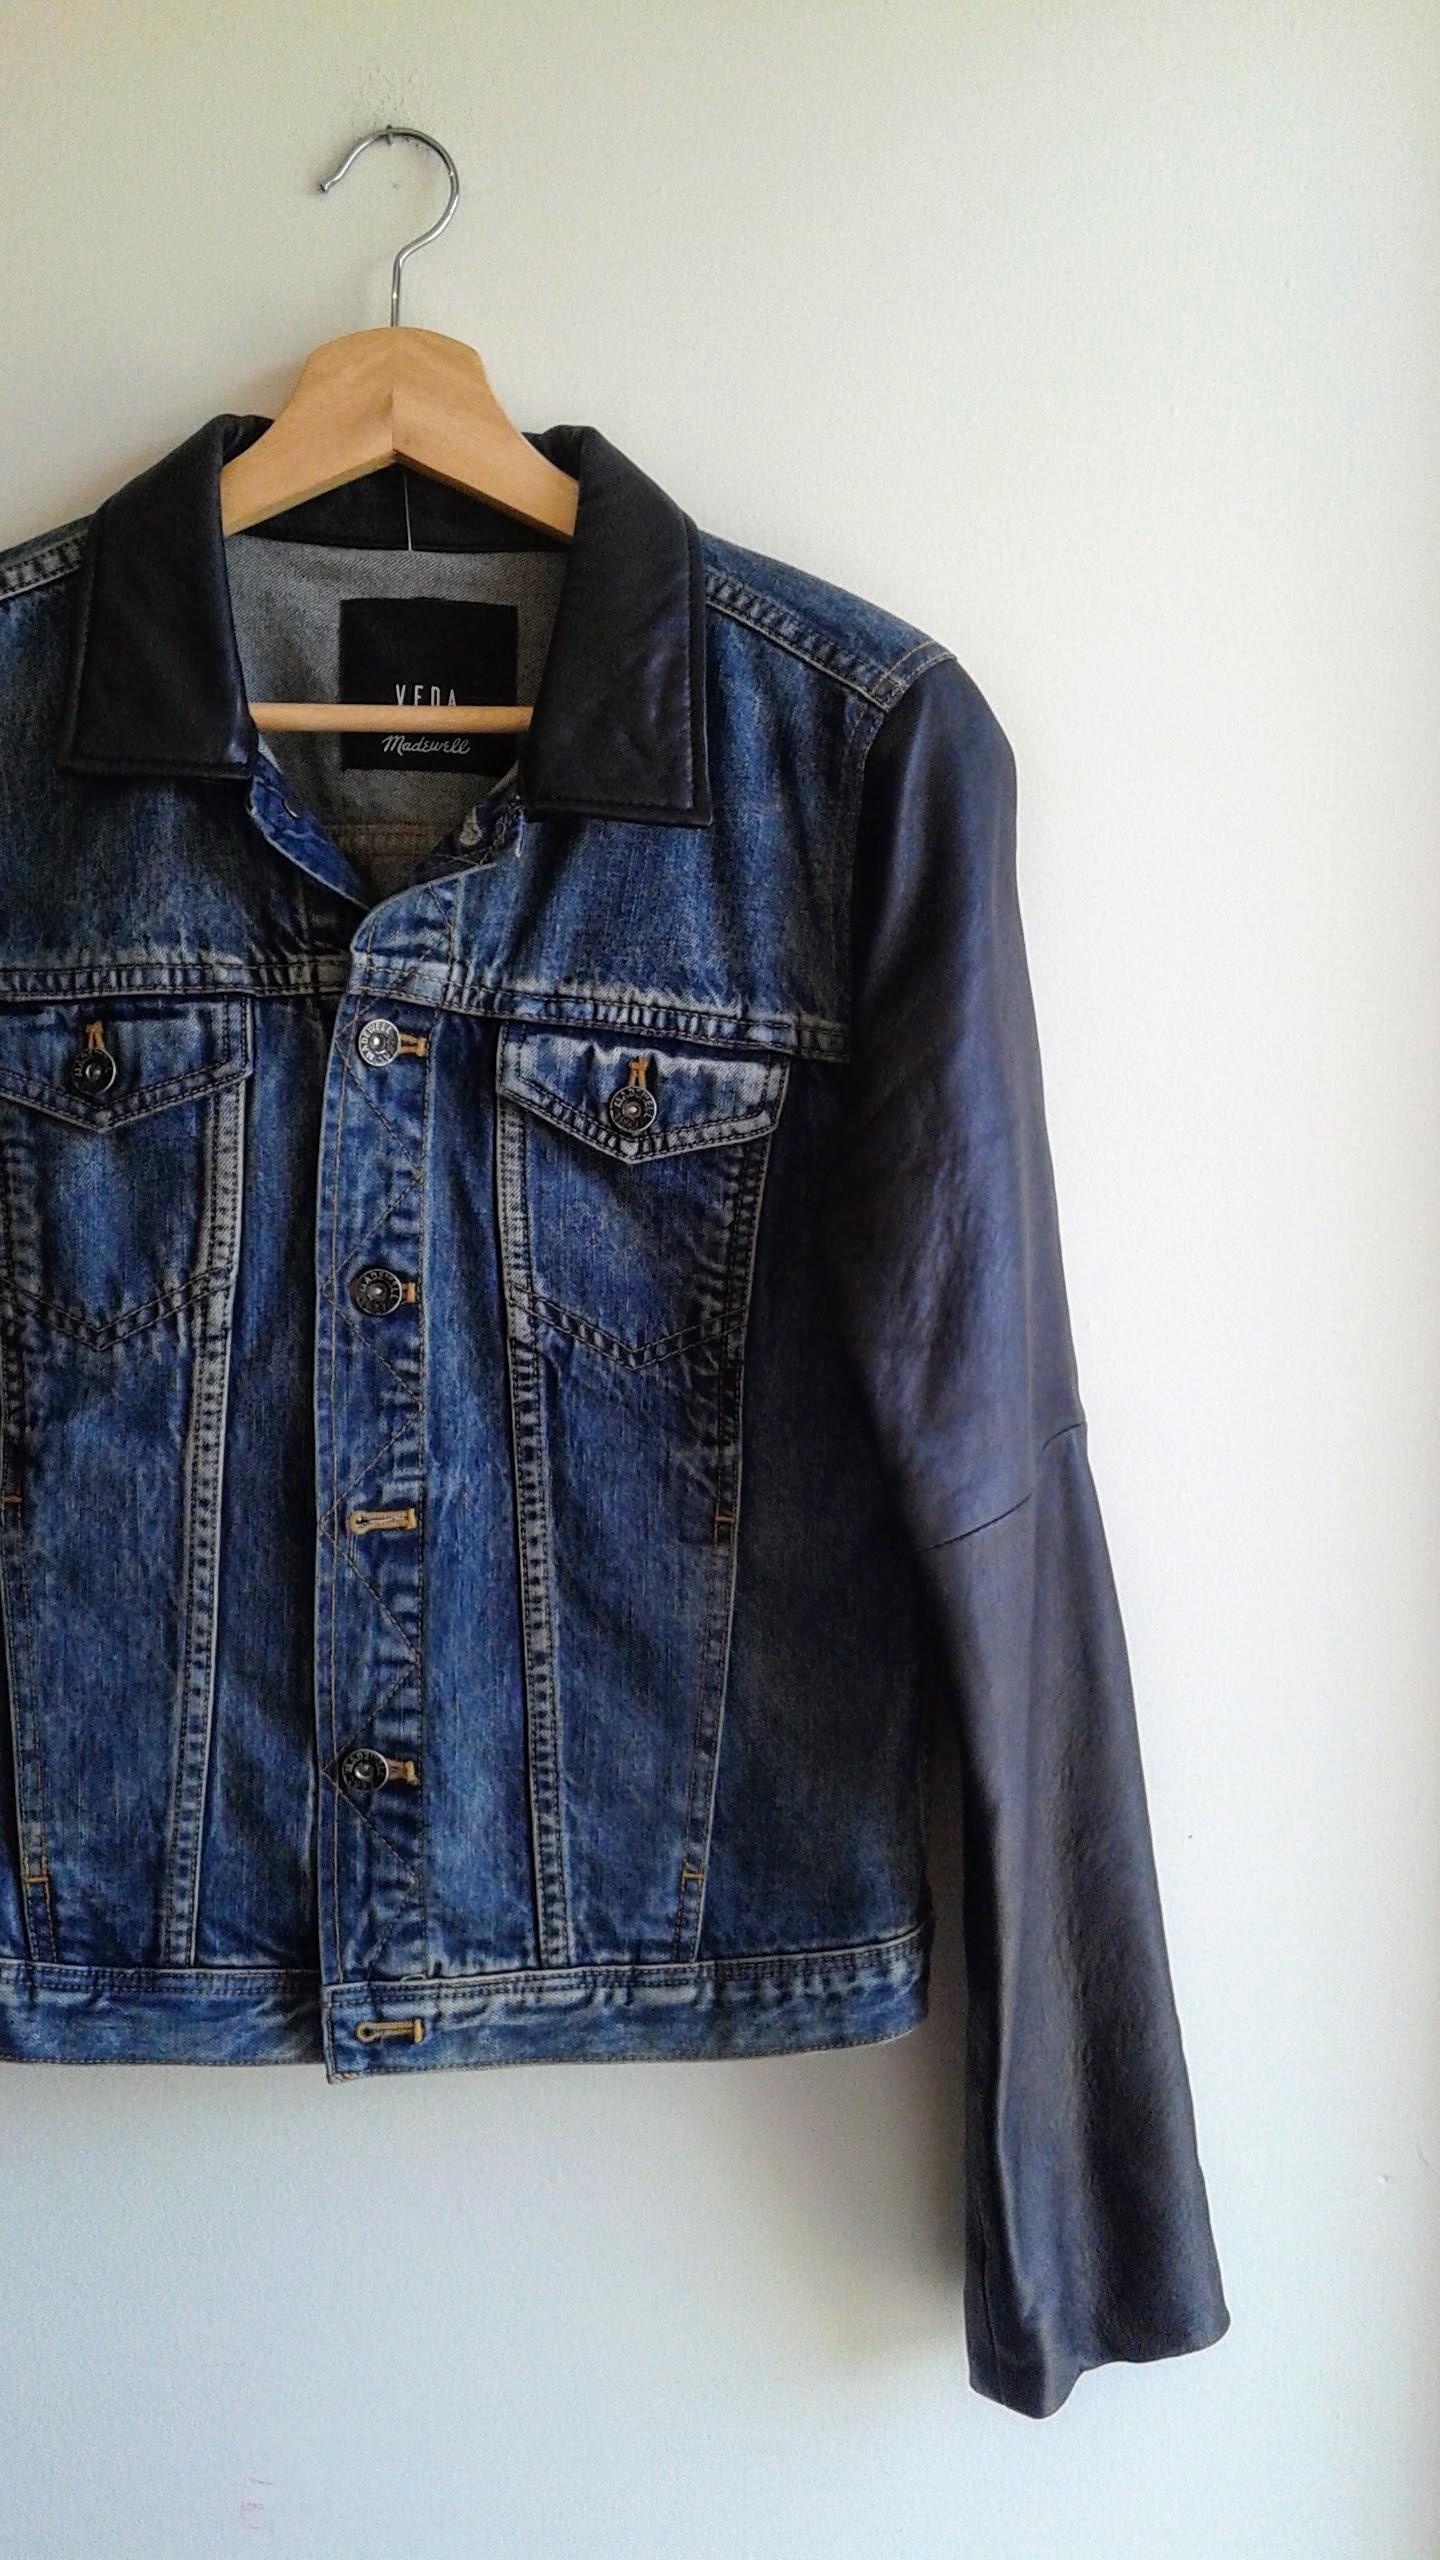 Madewell jacket; Size S, $42